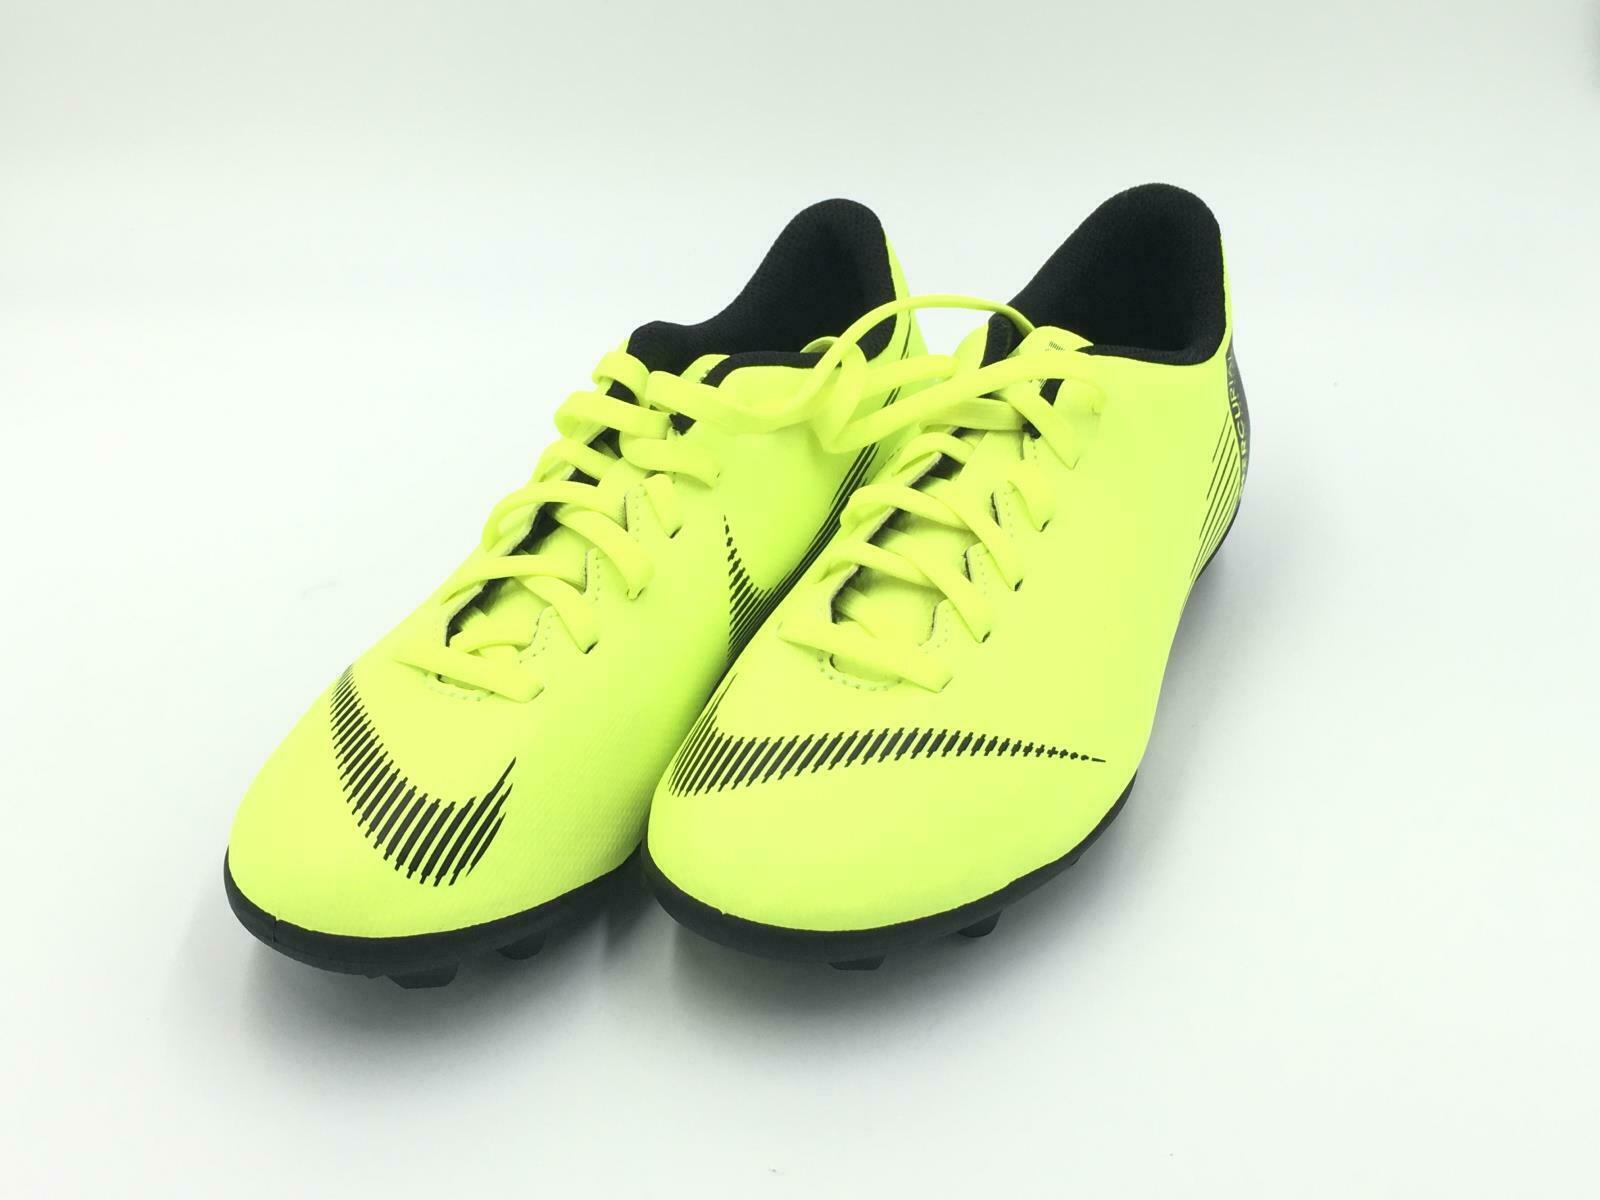 Nike Mercurial Vapor 12 GS Boy's Soccer